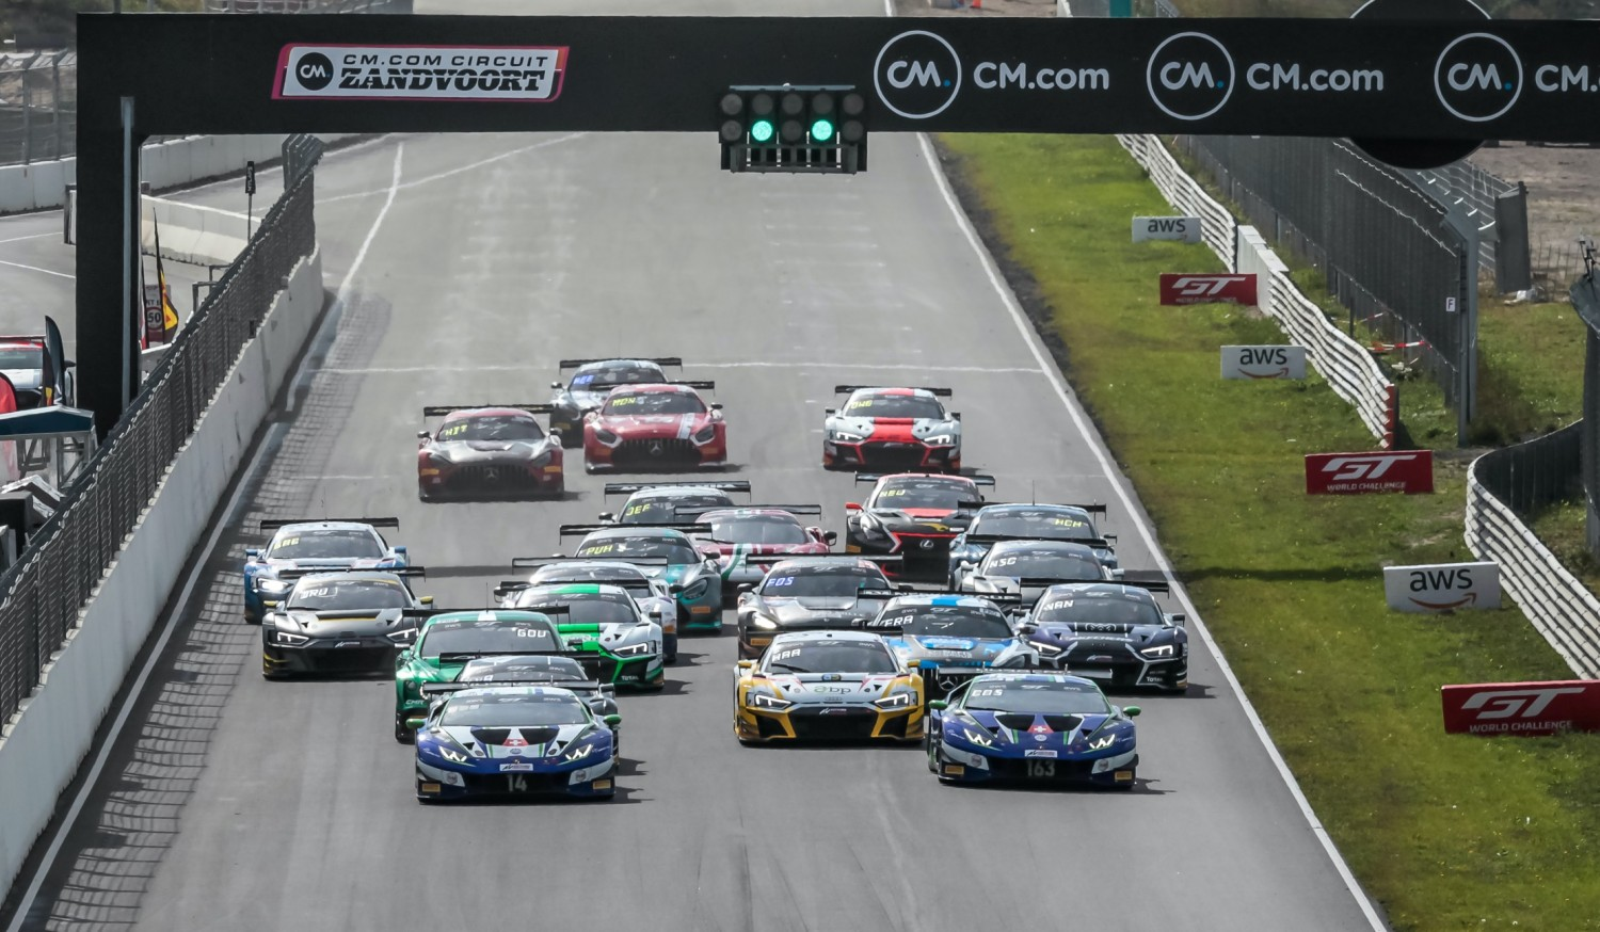 Costa and Altoè clinch maiden Sprint Cup win for Emil Frey Racing Lamborghini at Zandvoort